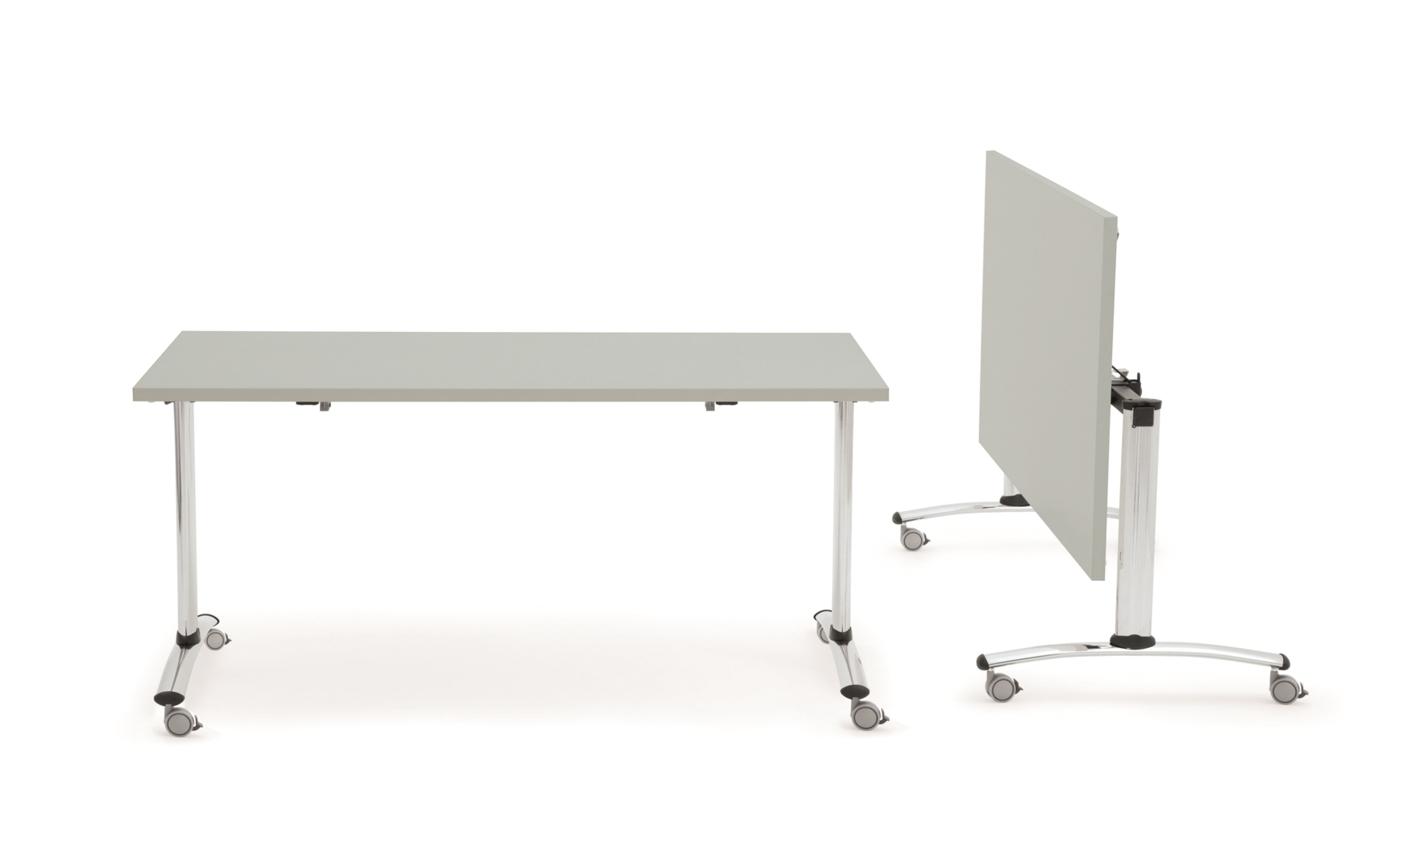 Linea fabbrica flipper 120 tavolo salvaspazio for Fabbrica tavoli